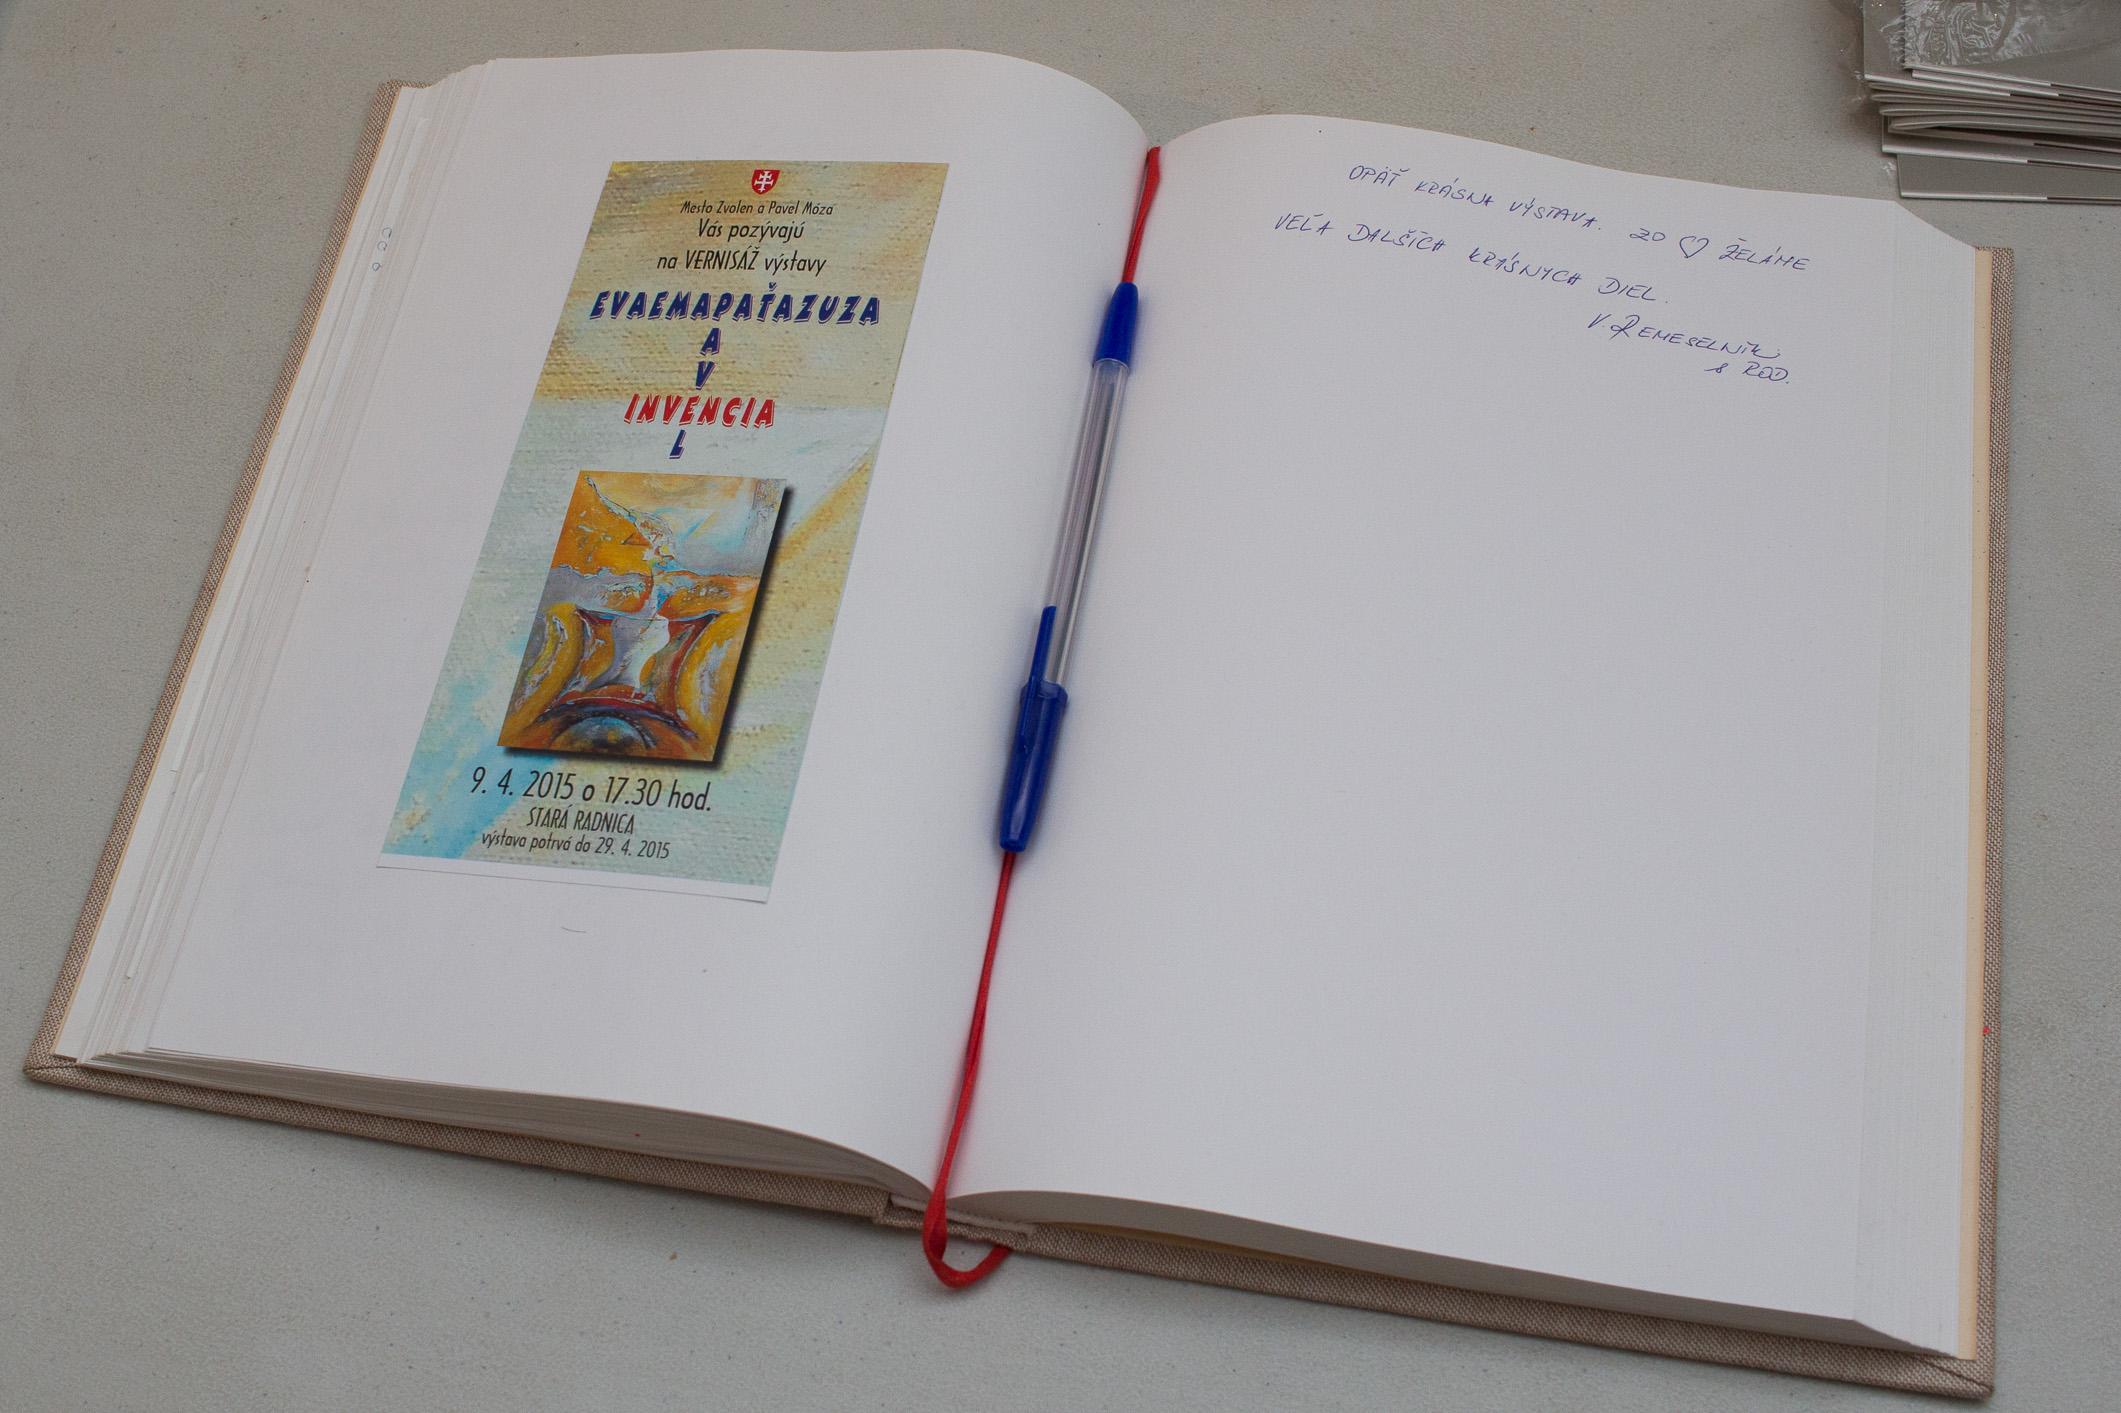 pavel-moza-invencia-4